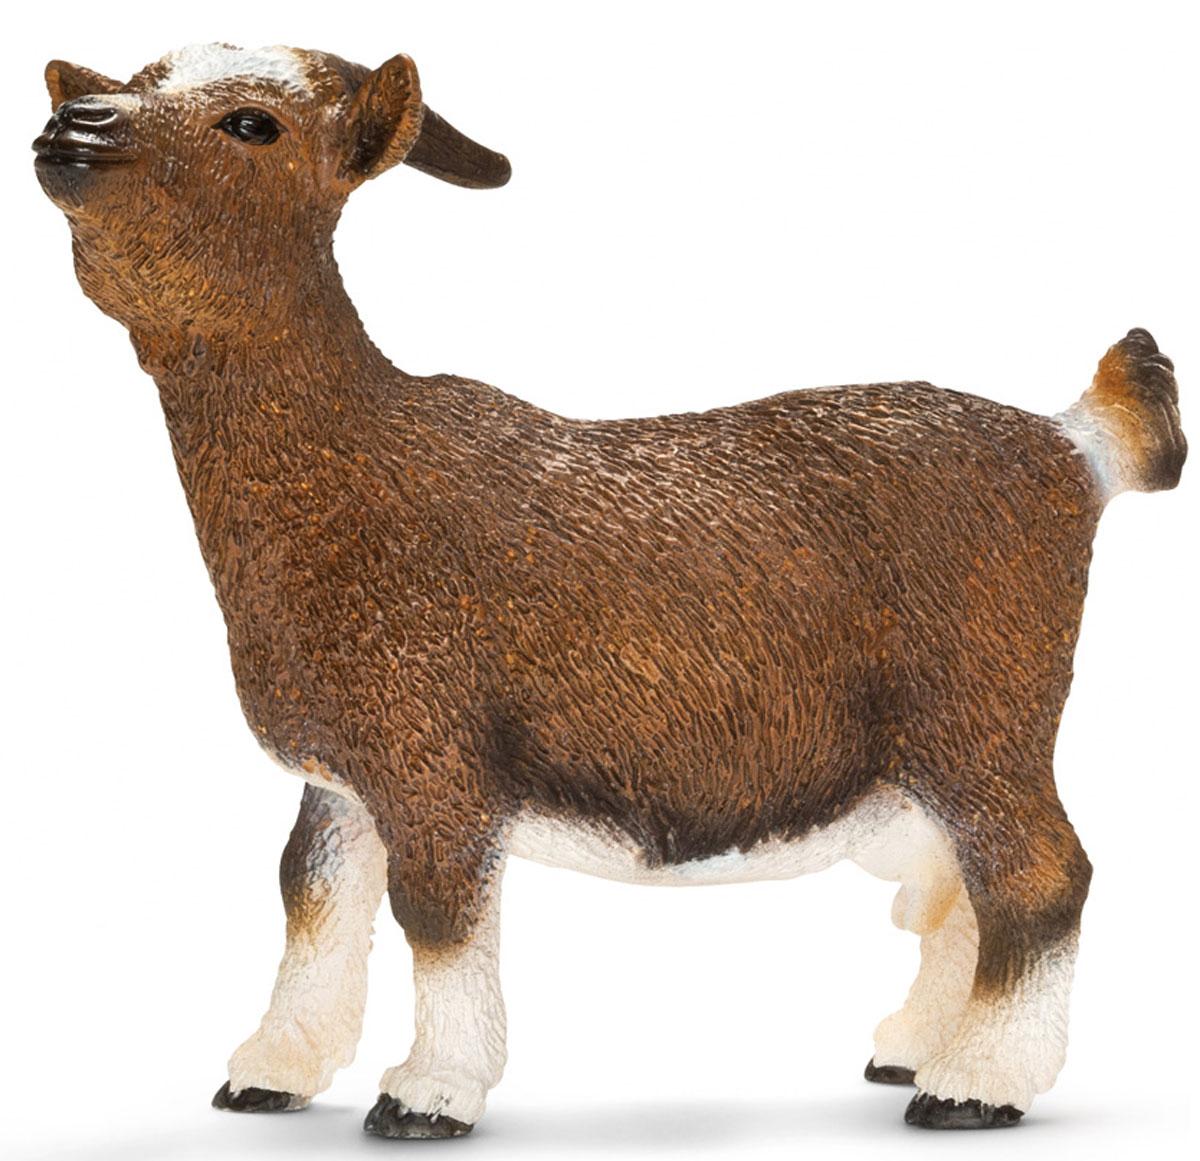 Schleich Фигурка Карликовый козел фигурка карликовый козел schleich фигурка карликовый козел